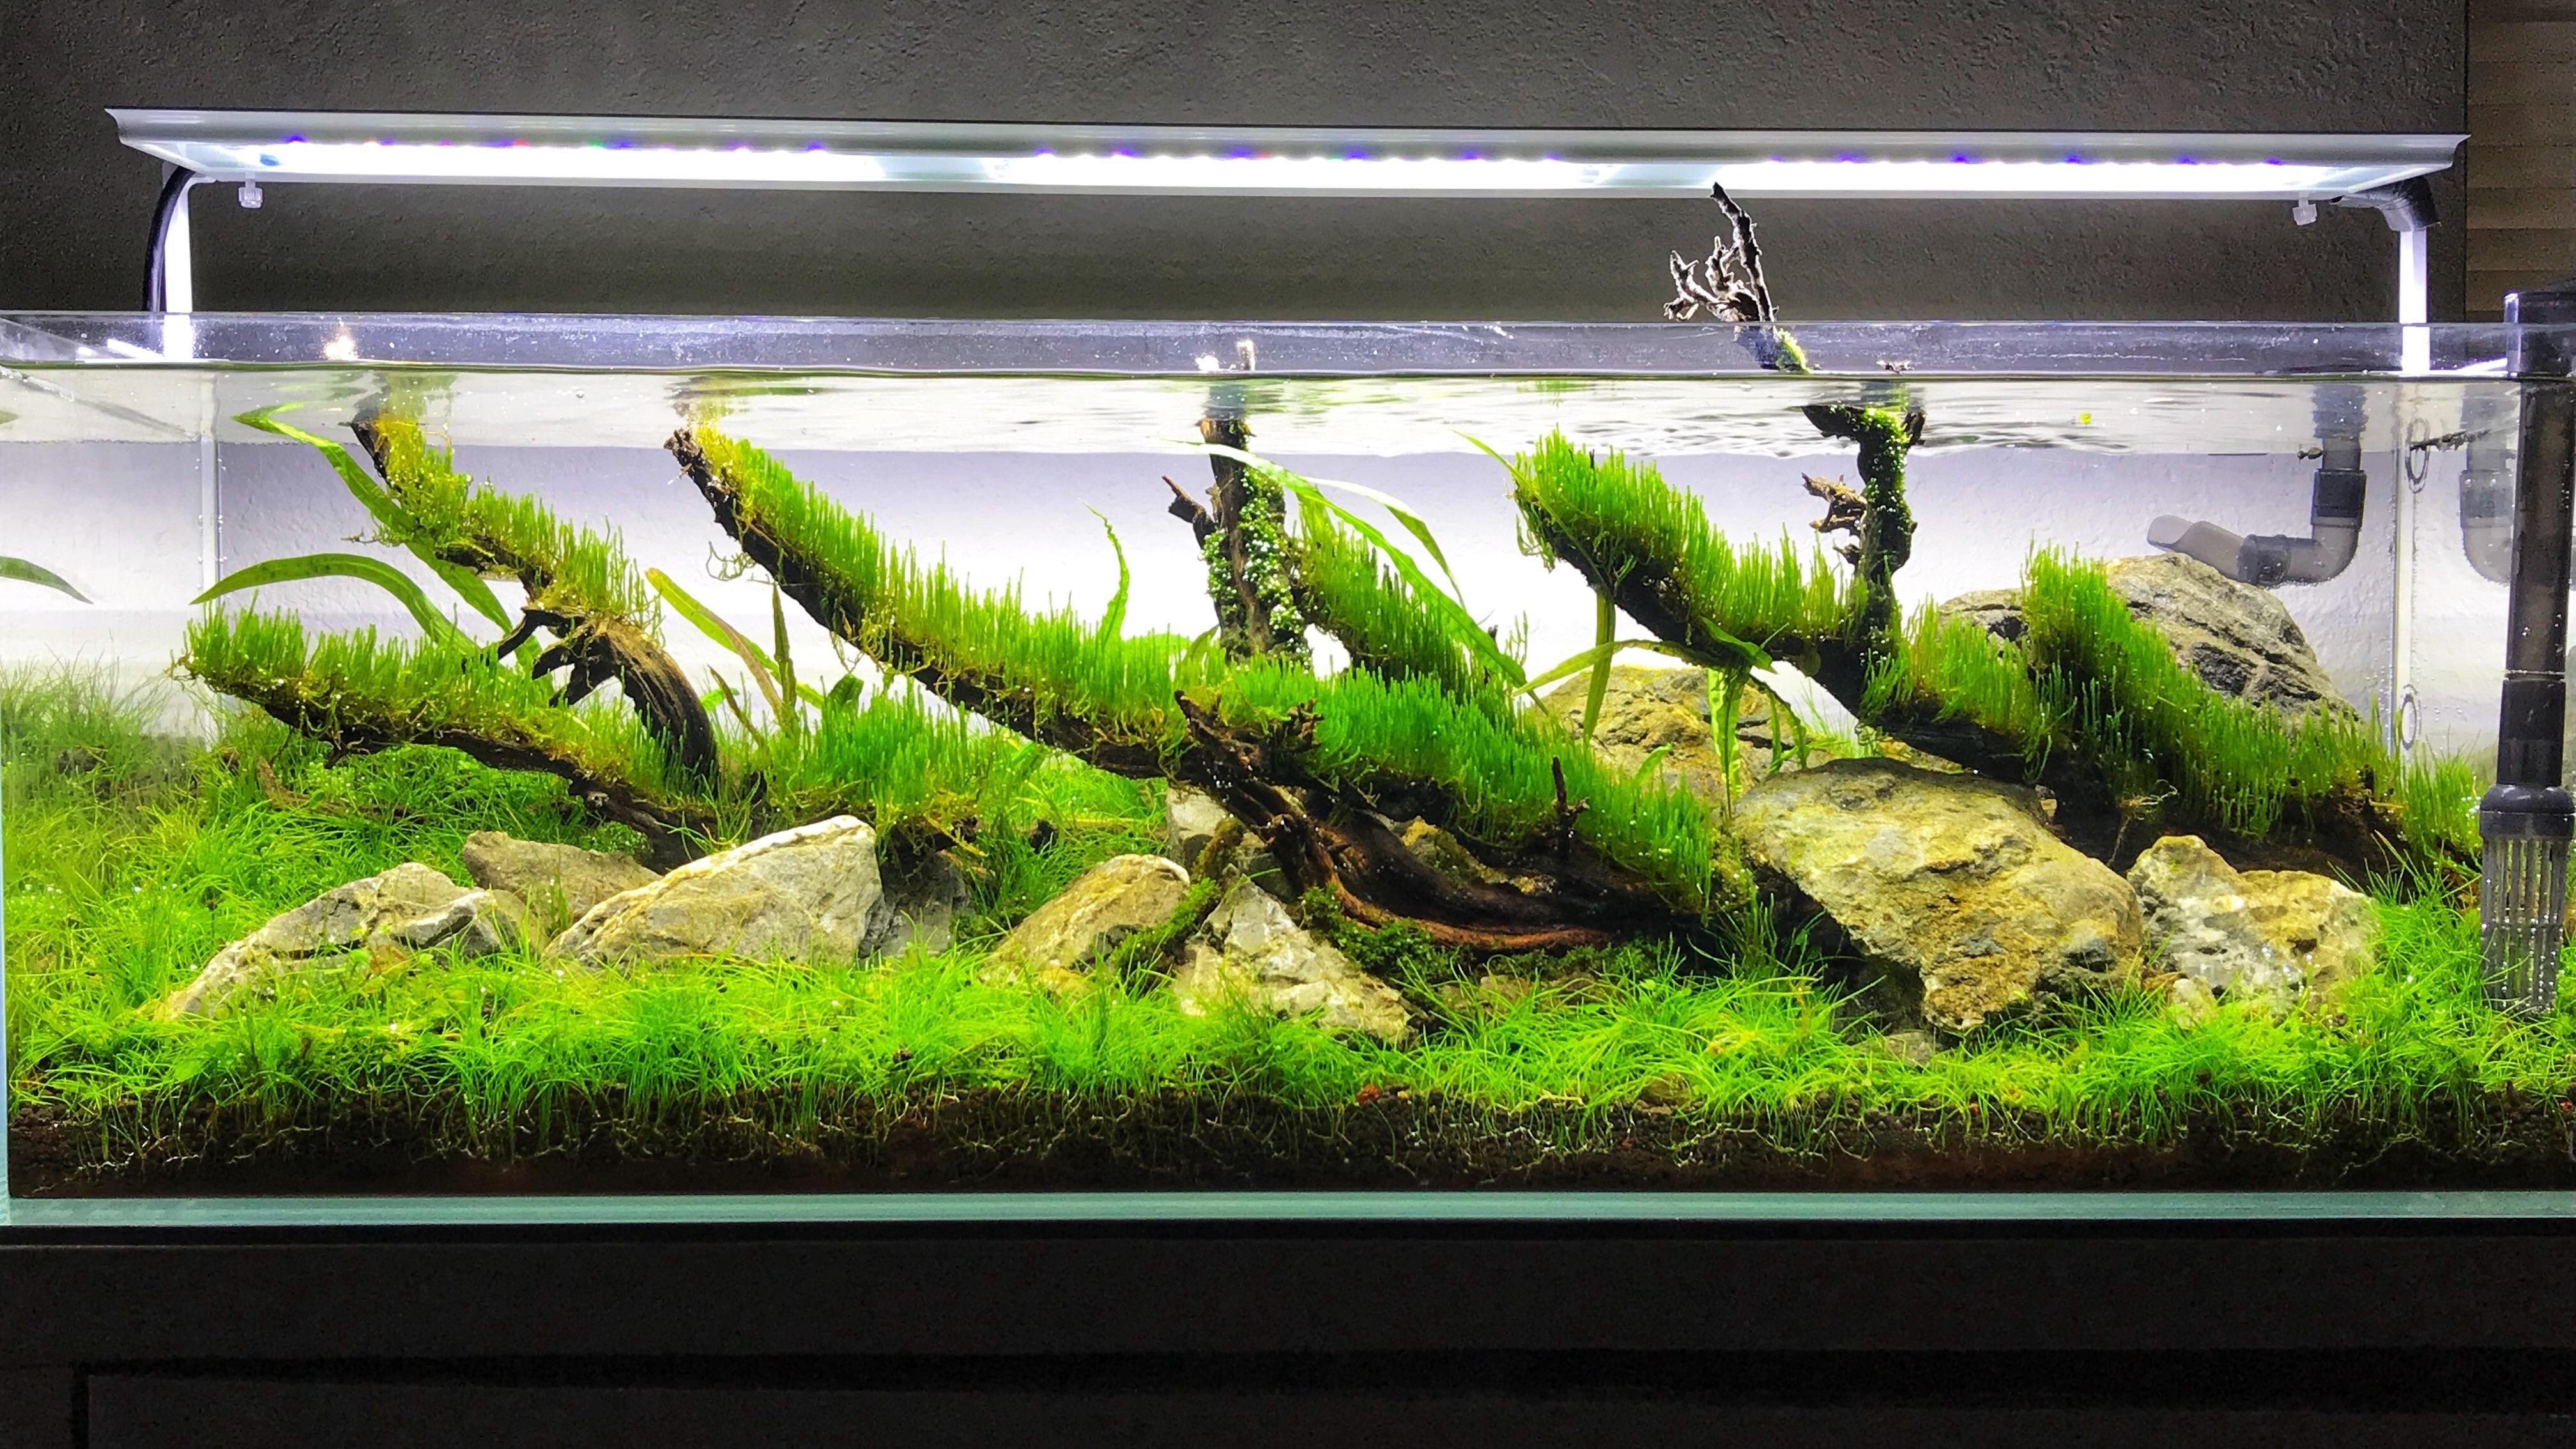 3whl5mwgtl201 4032—2268 Freshwater Aqua Scaping